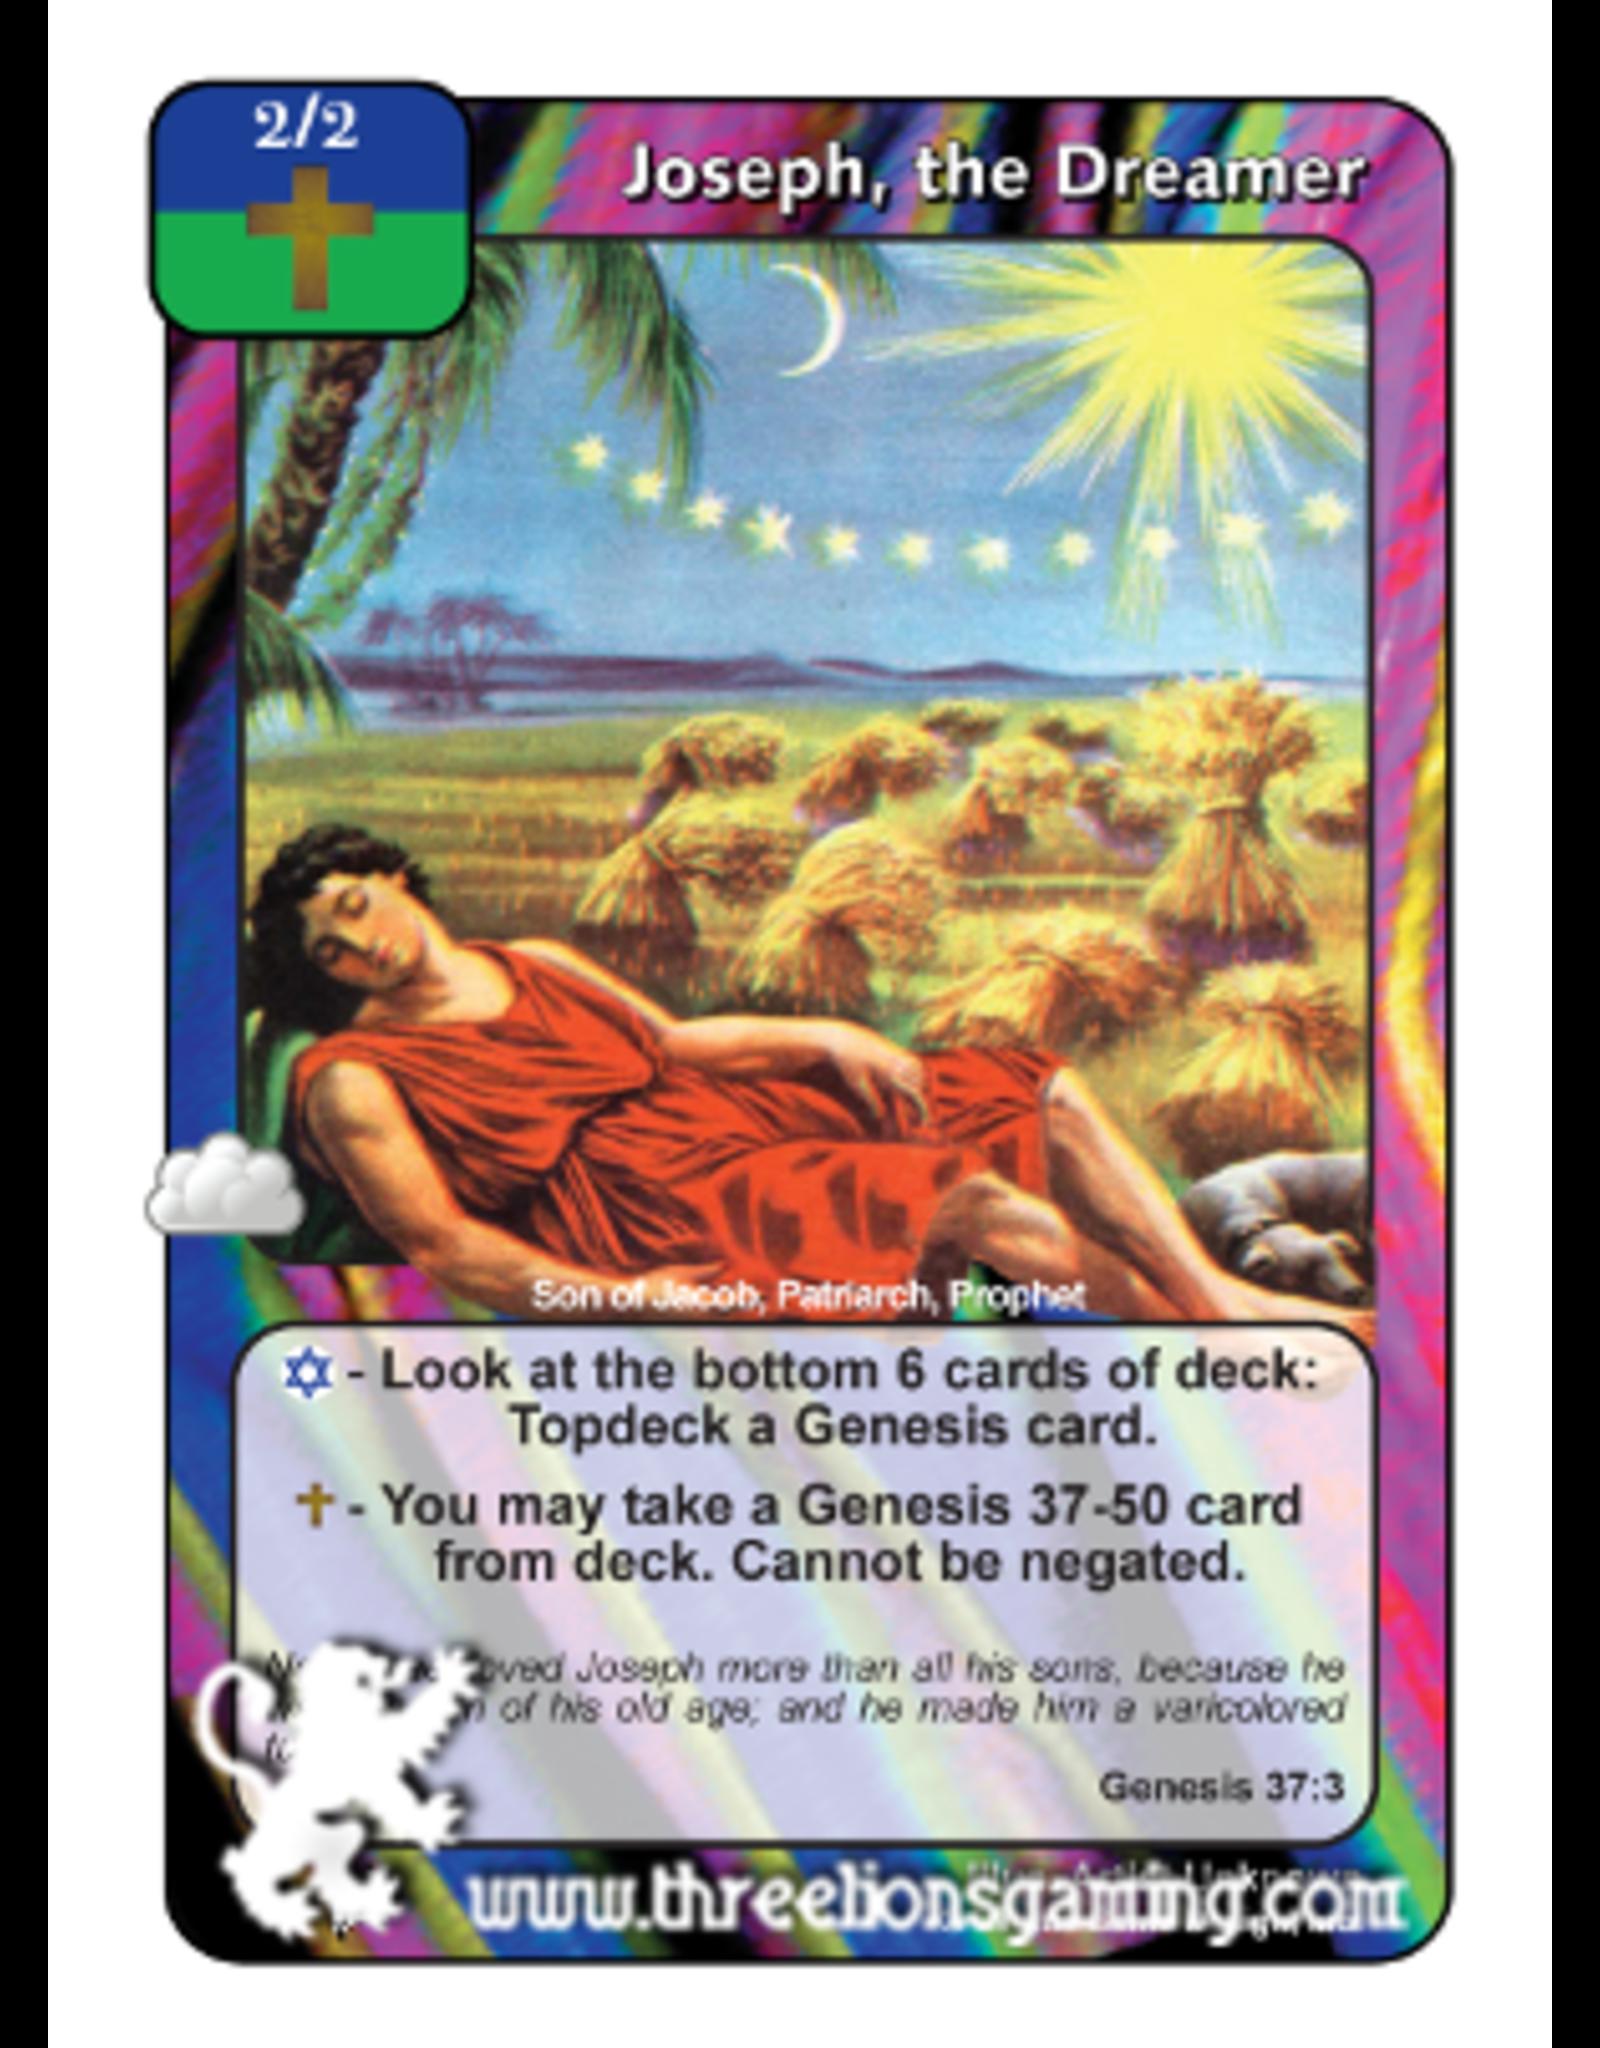 PoC: Joseph, the Dreamer